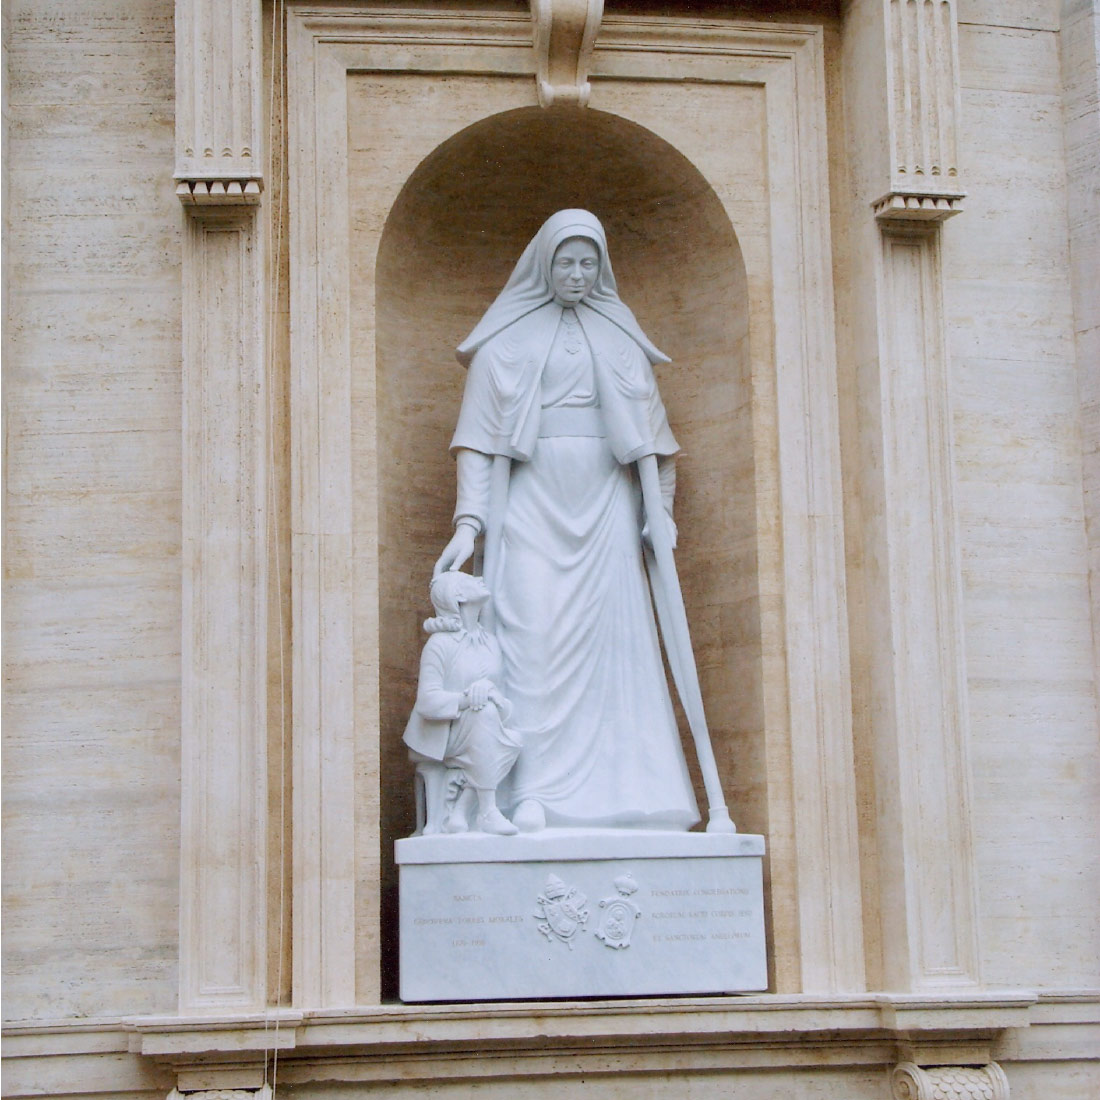 Saint Genoveffa Torres Morales